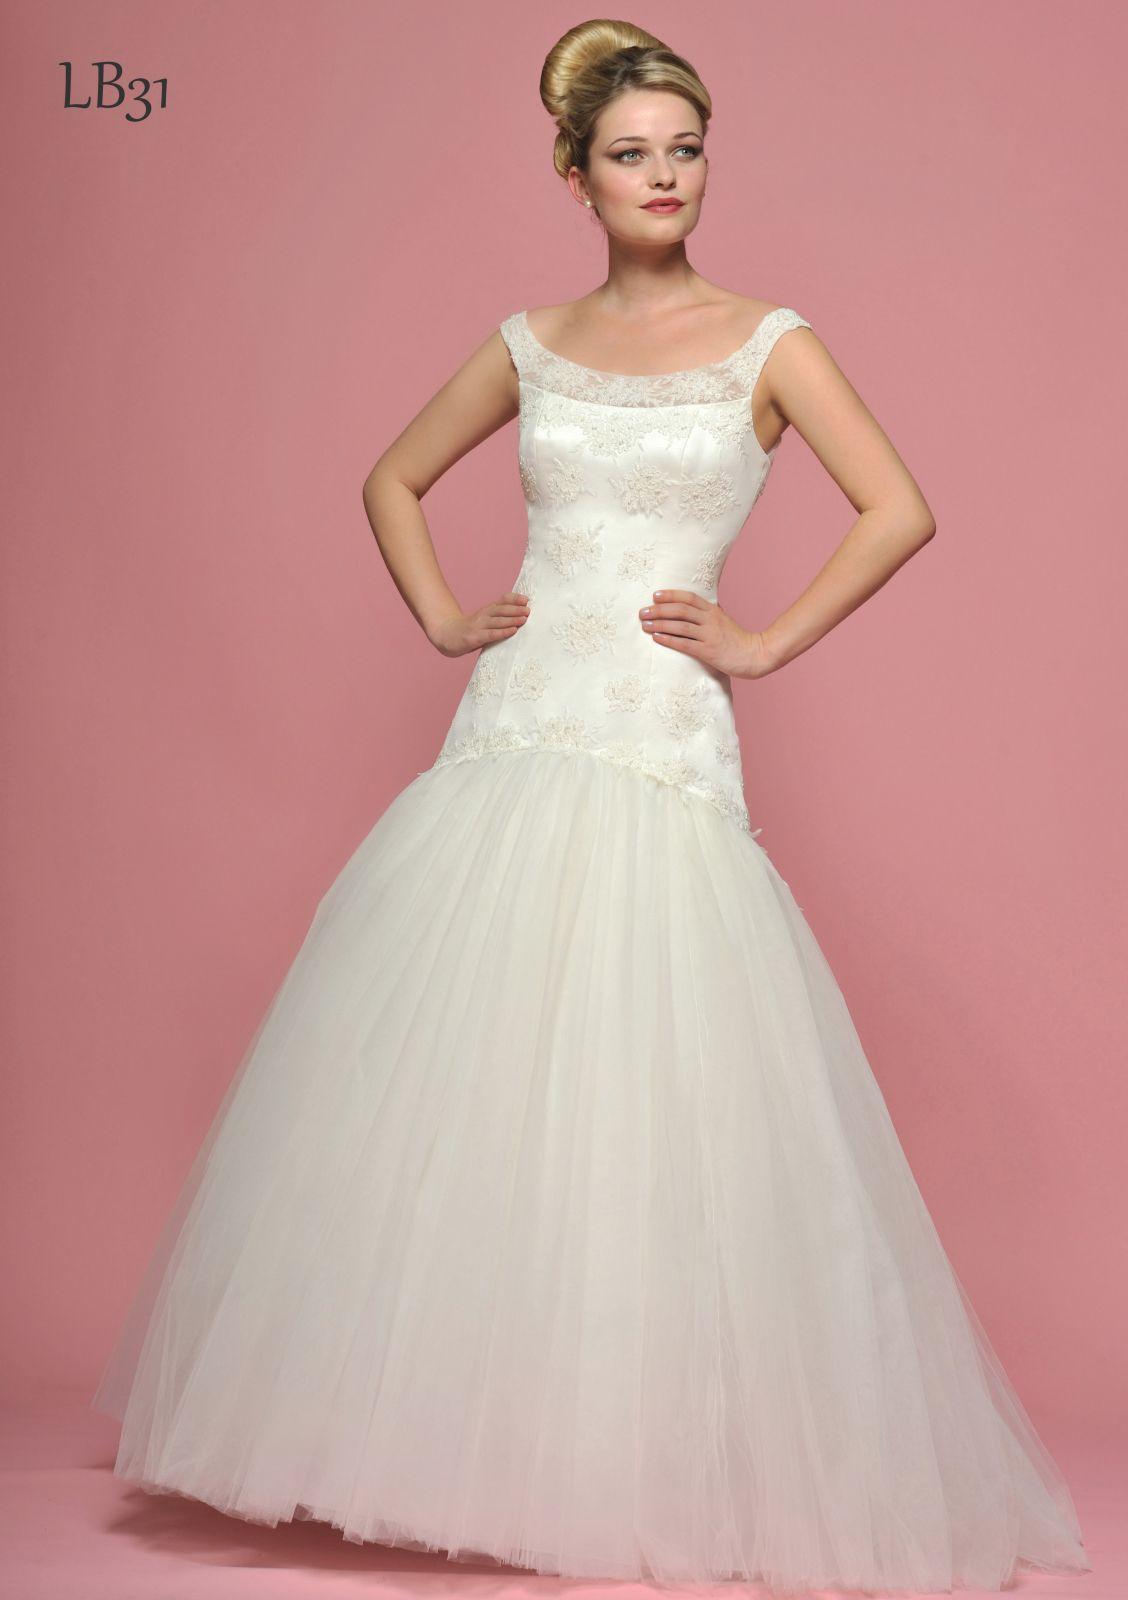 LB31aF from LouLou Bridal | Happy ever after bridal boutique ...